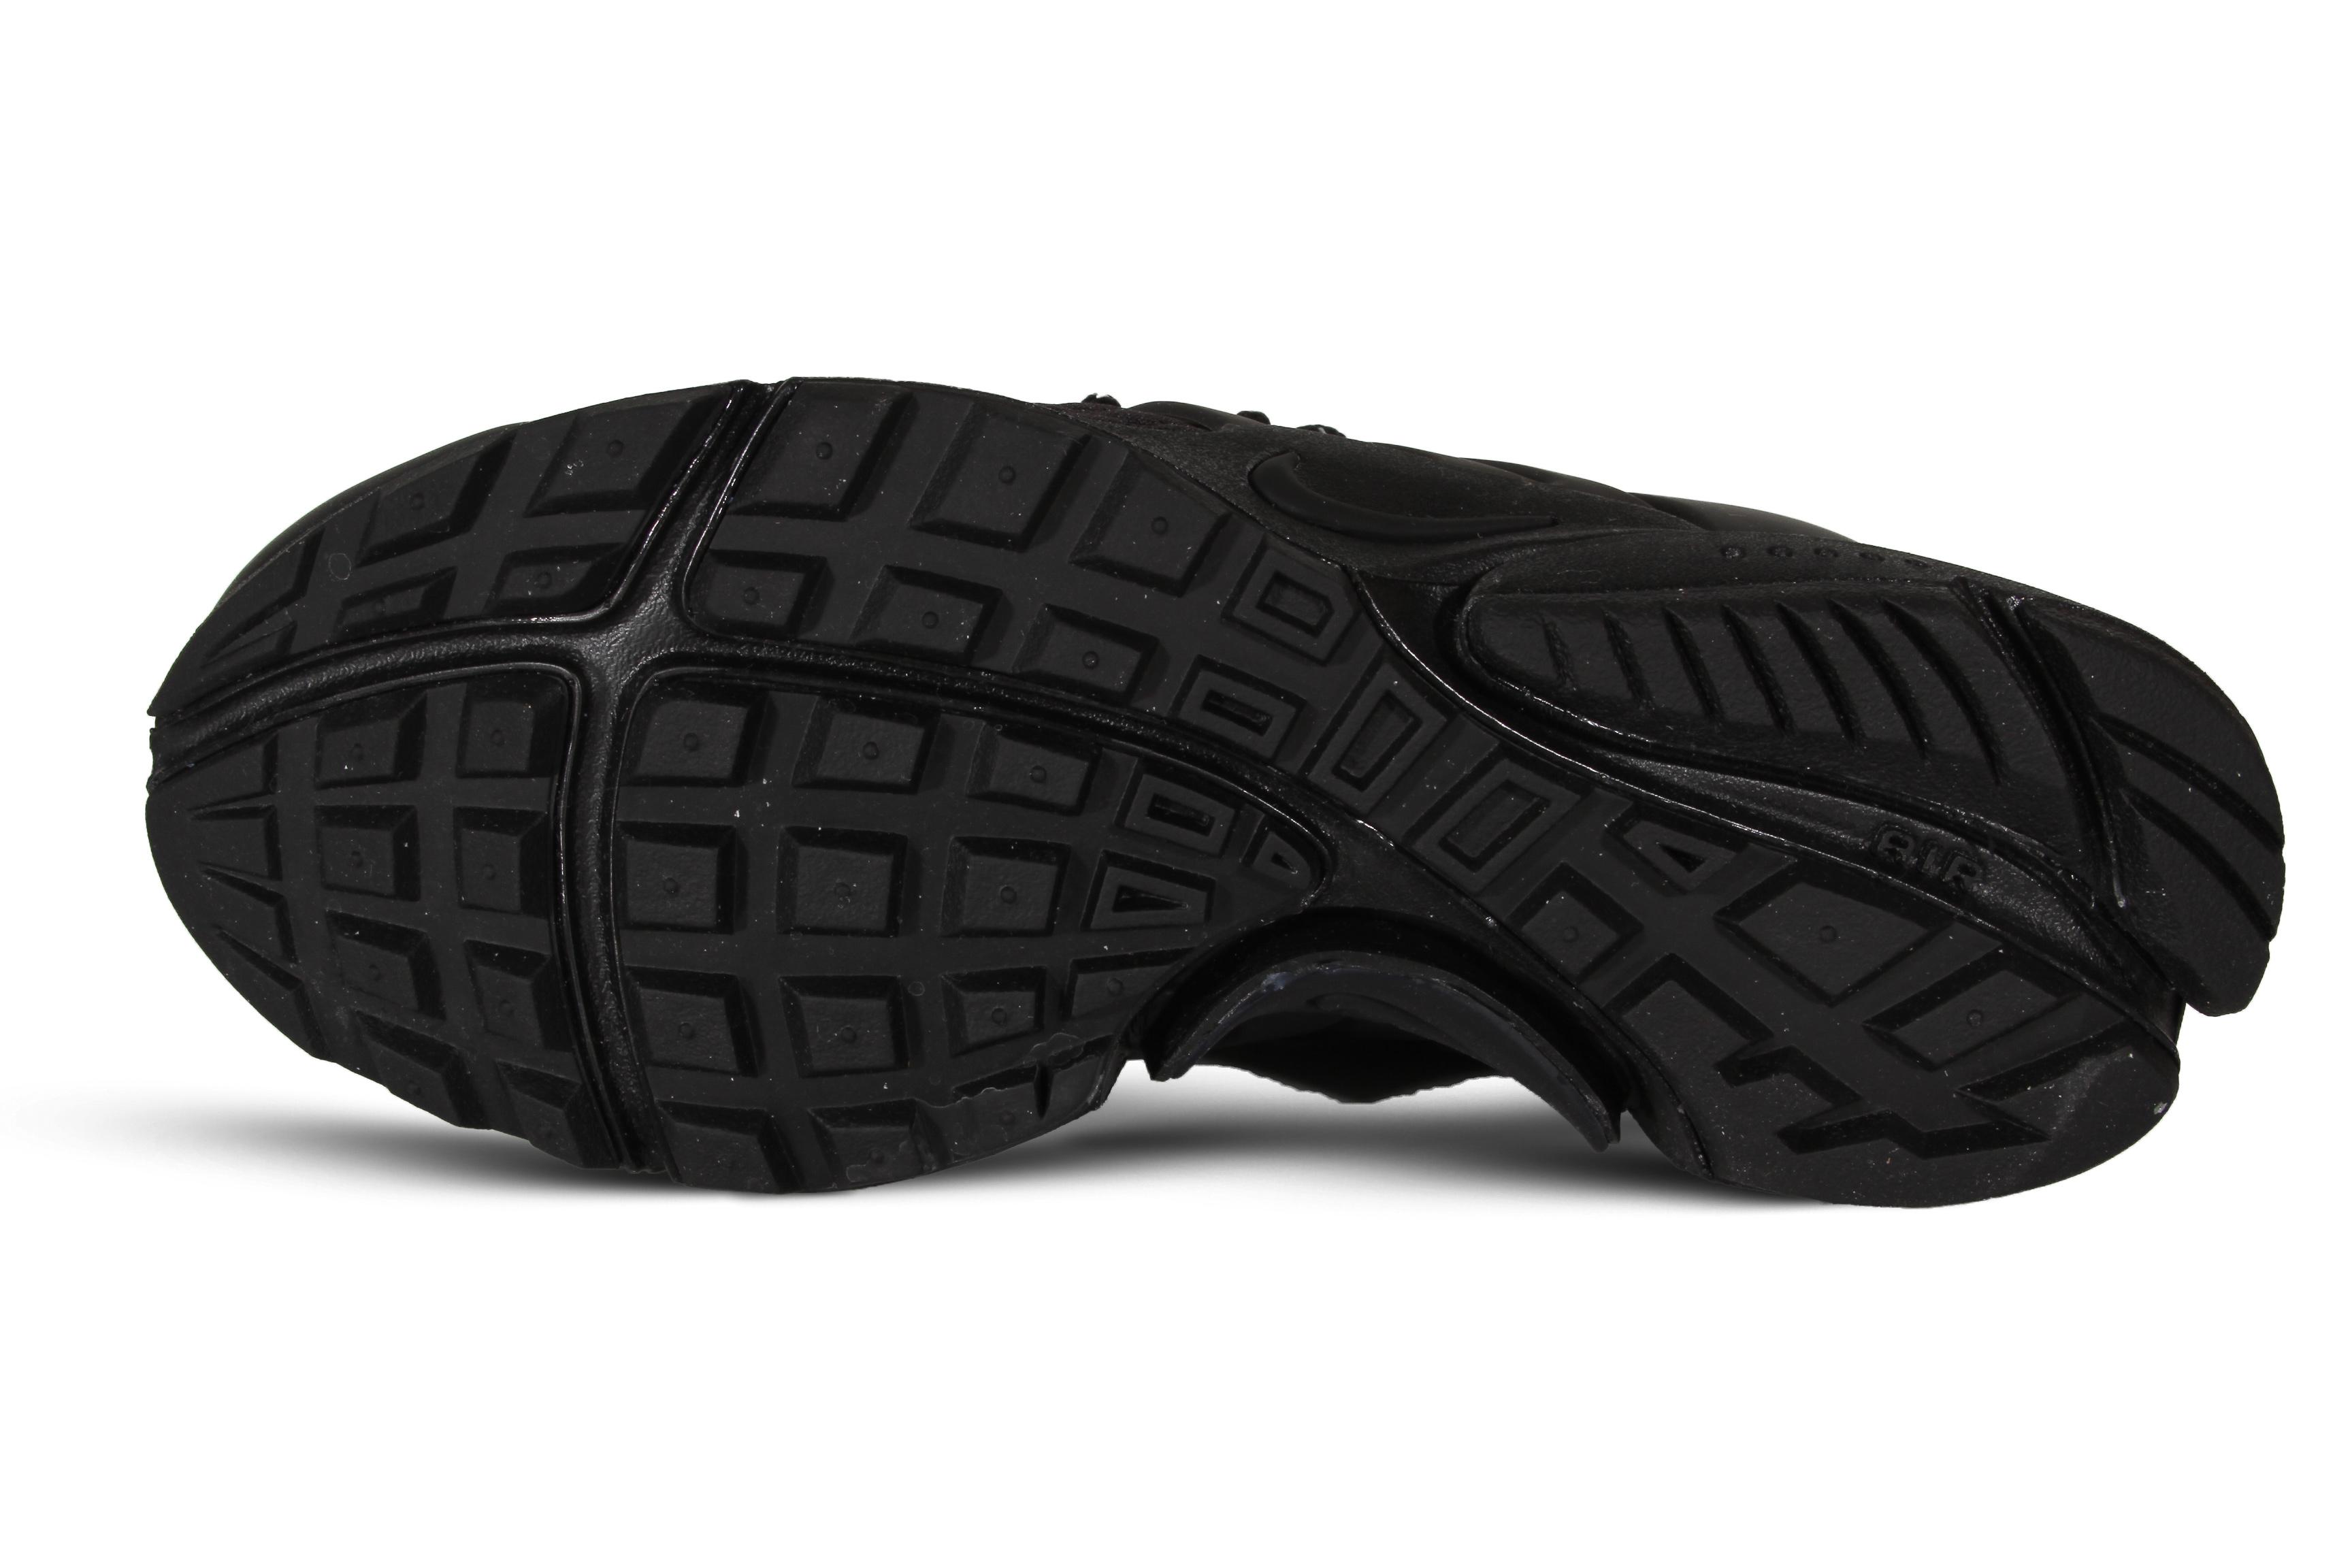 outlet store 65bce f4e1c ... Women s Nike Air Presto Mid Utility Premium Premium Premium Running Shoes  AA0674-003 608a0a